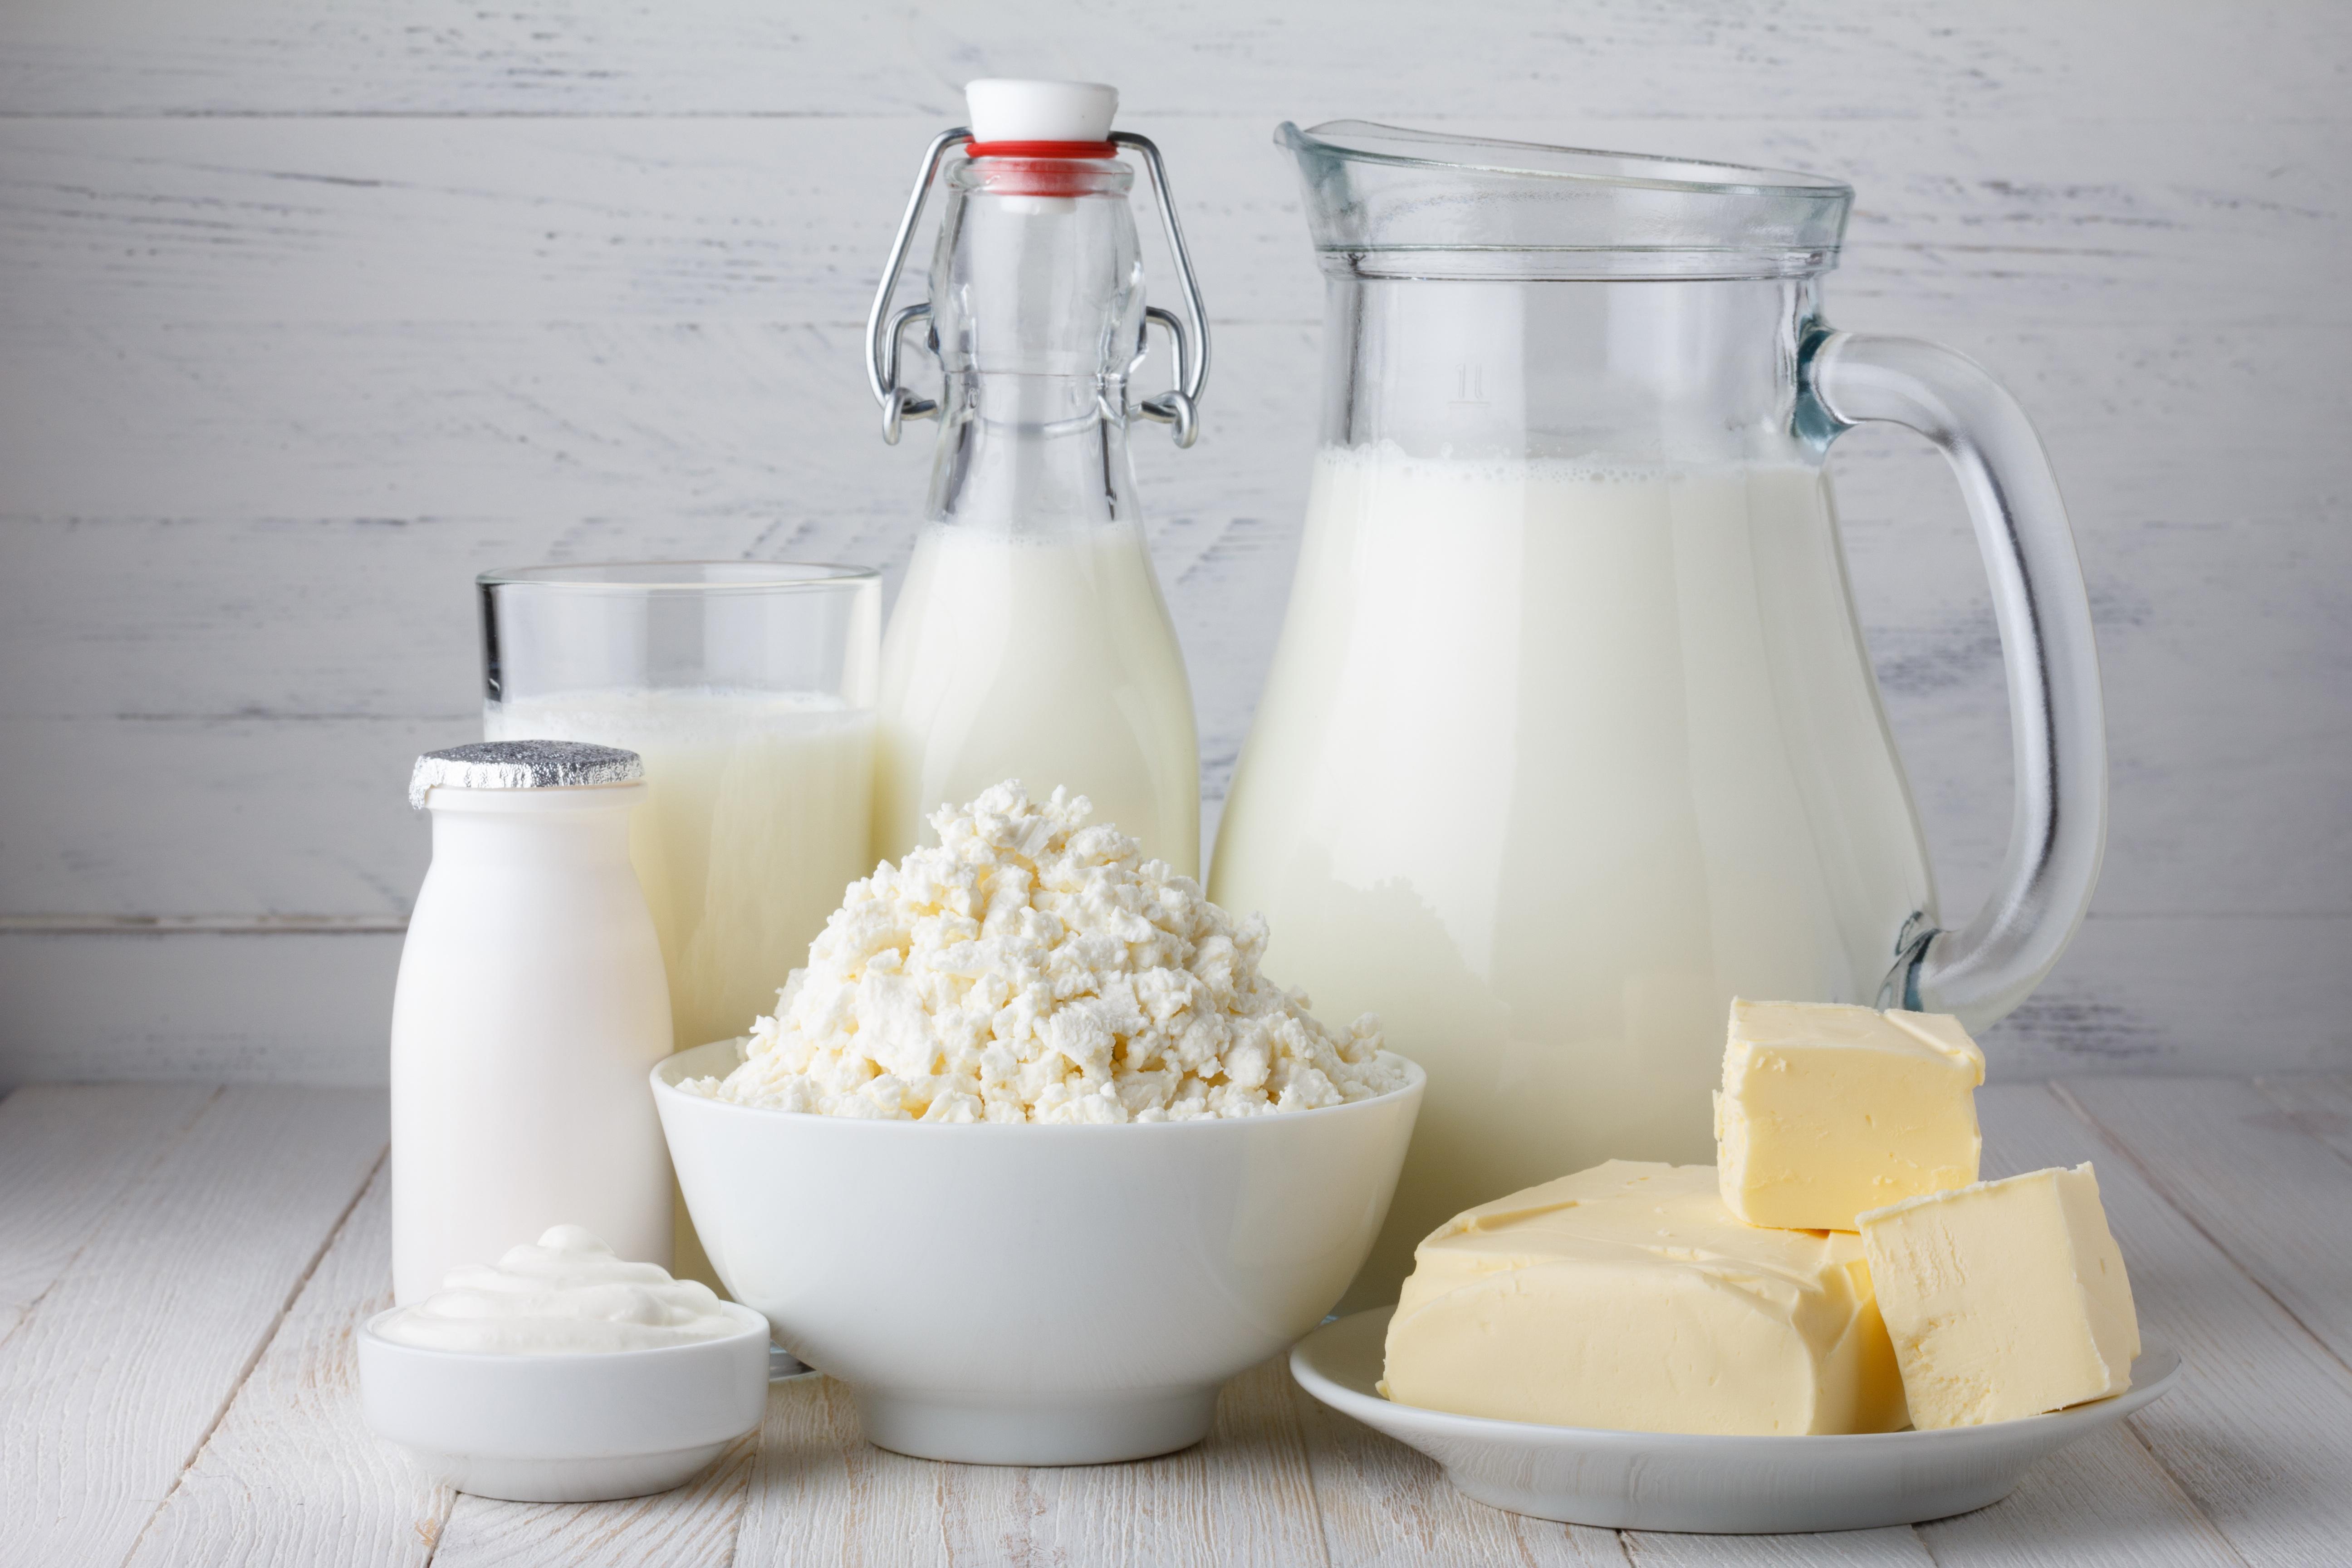 milk-cream schwanger